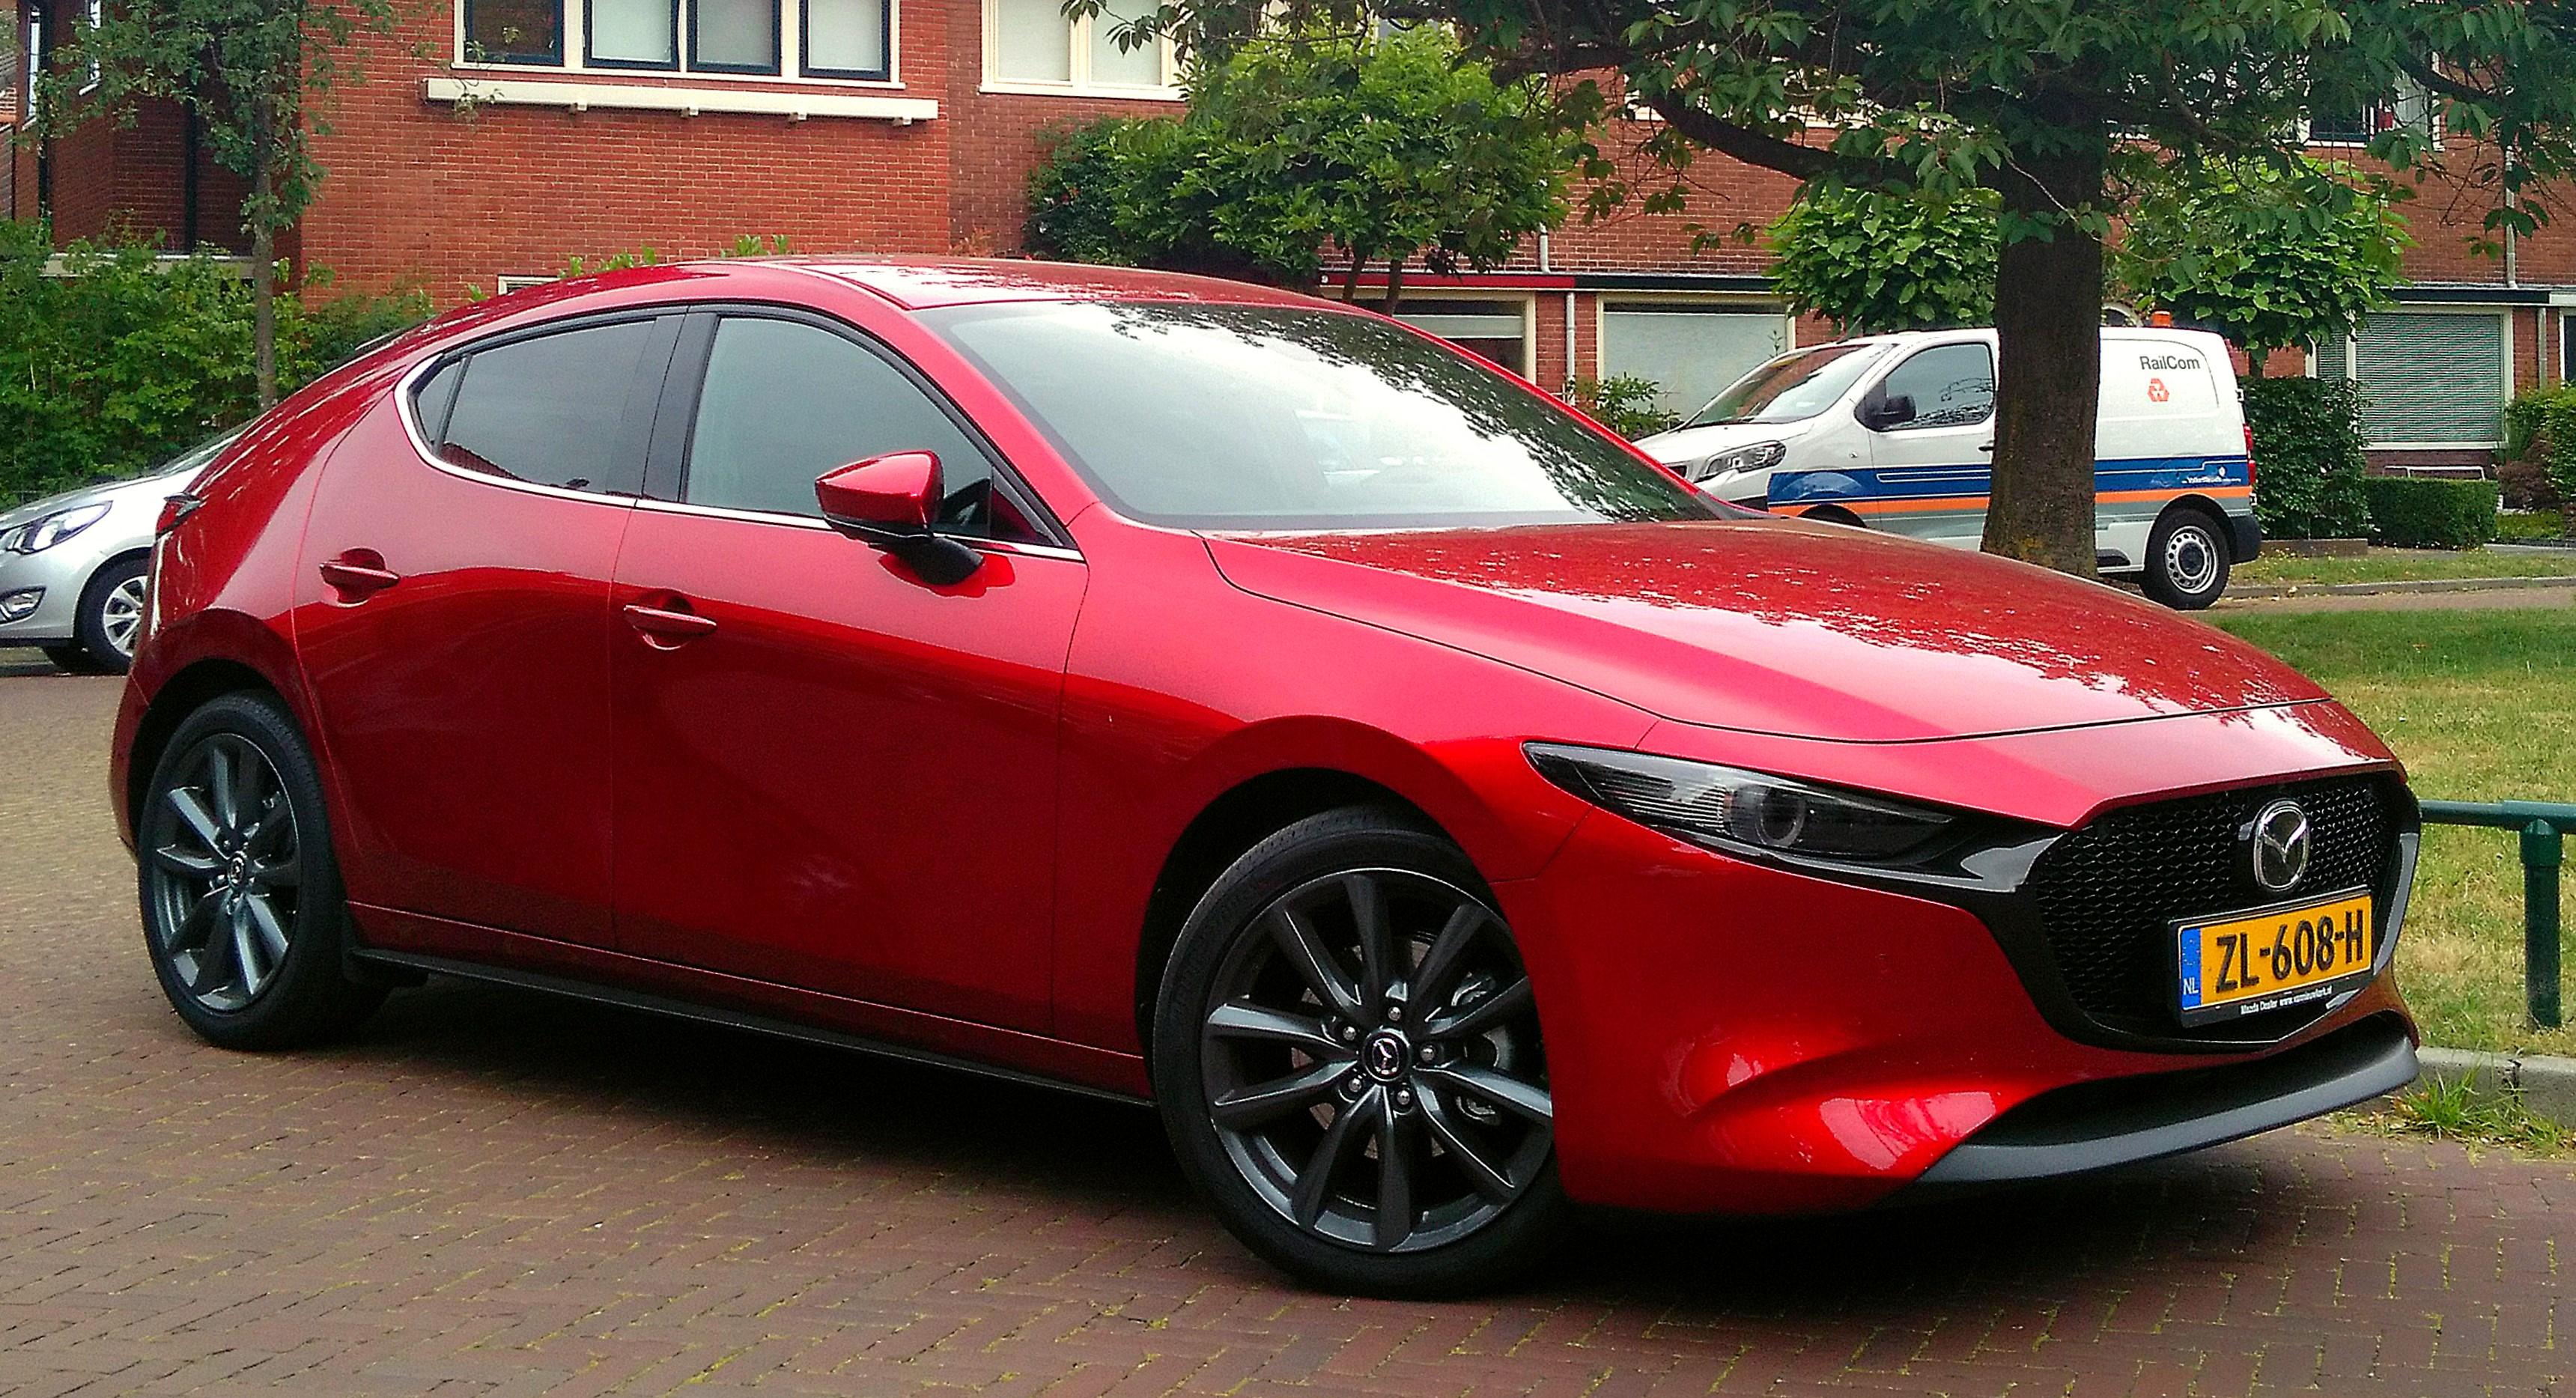 Kelebihan Kekurangan Mazda 3 Bm Murah Berkualitas